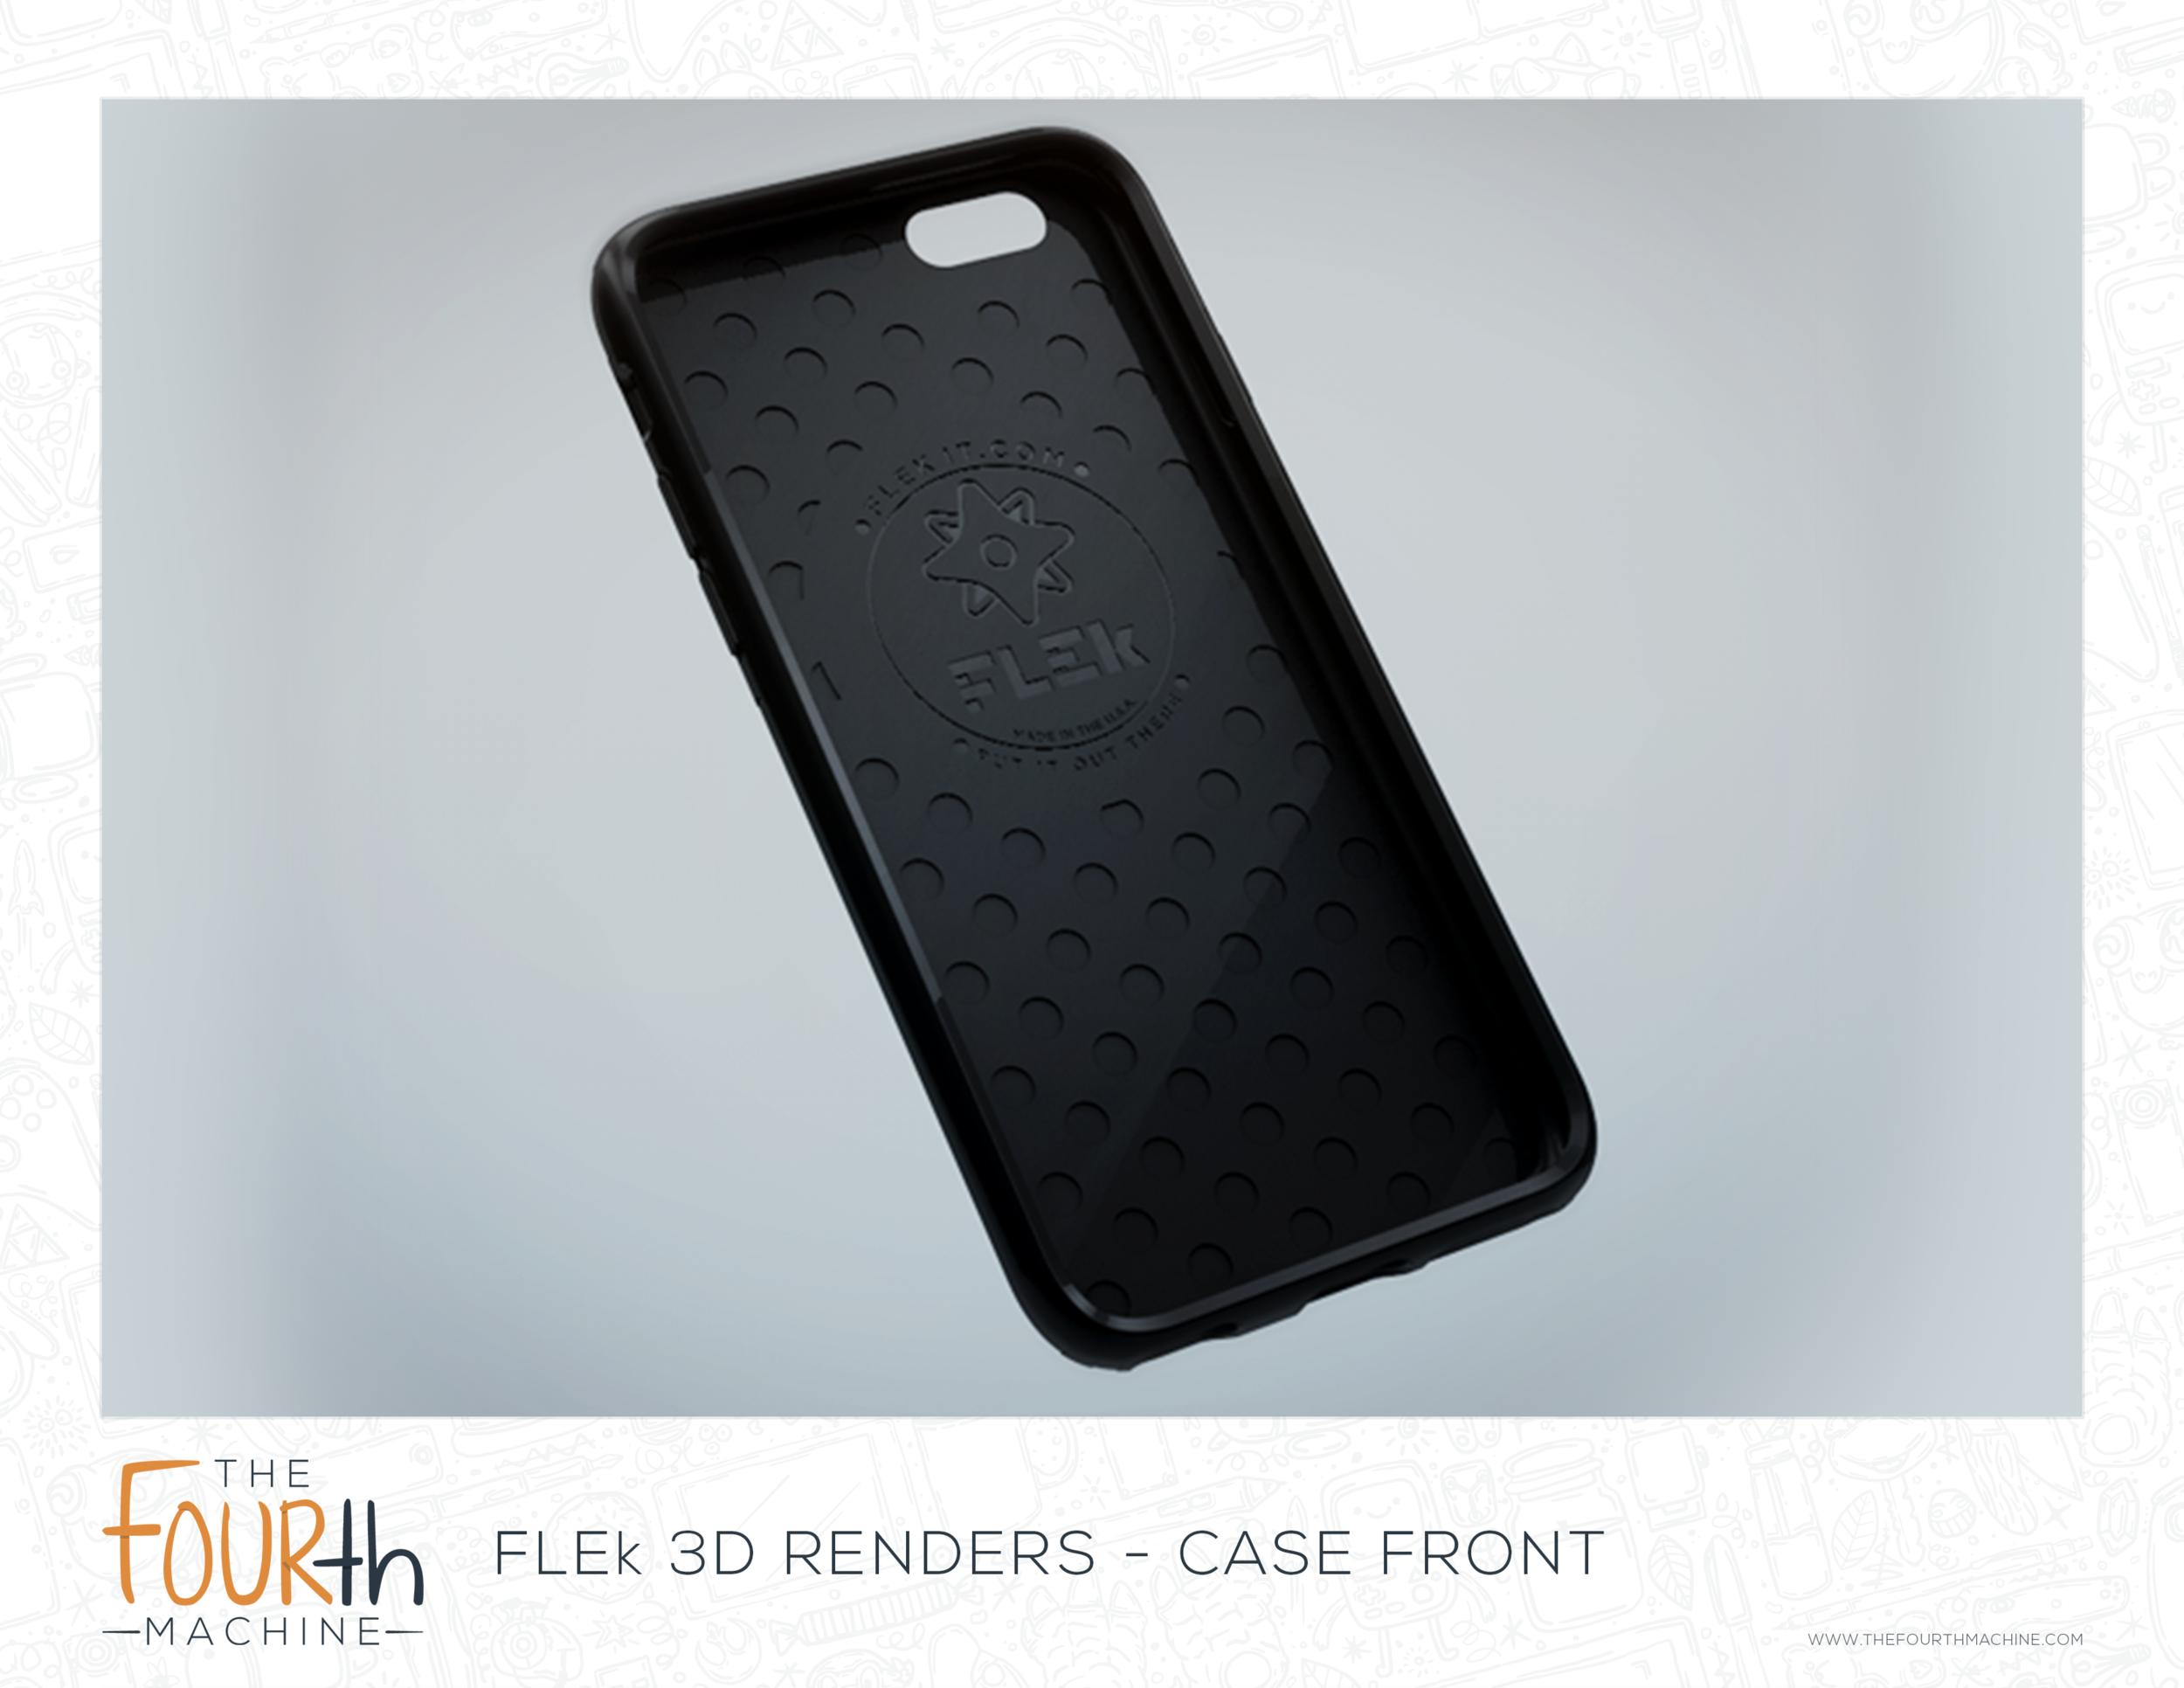 FLEk_3D_Renders_Case Front.png